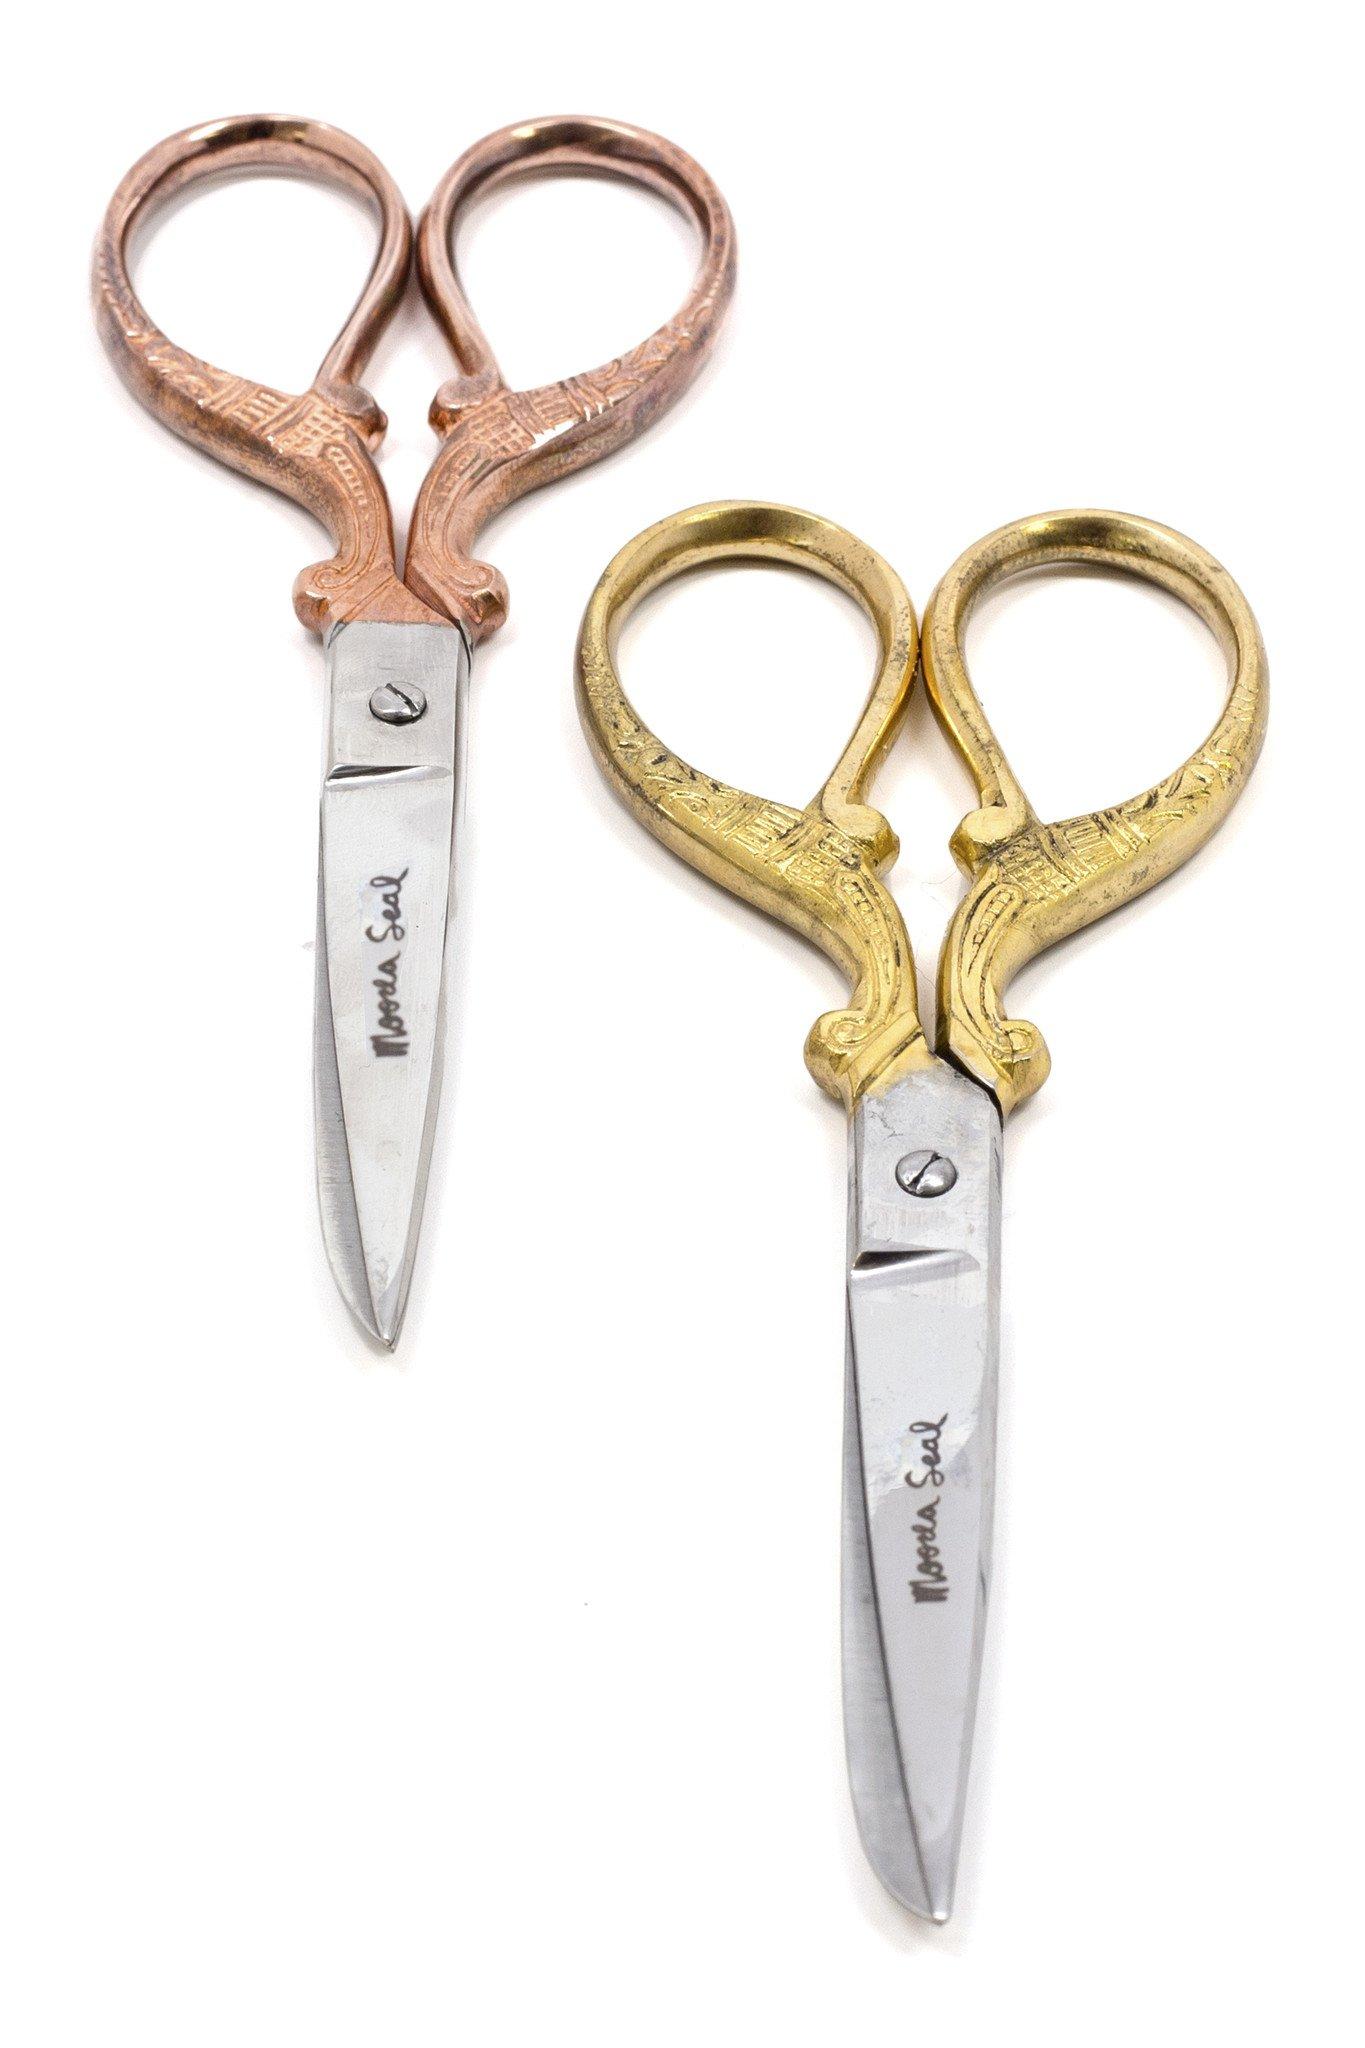 Moorea Seal Rose Gold Heritage Scissors by Moorea Seal (Image #2)